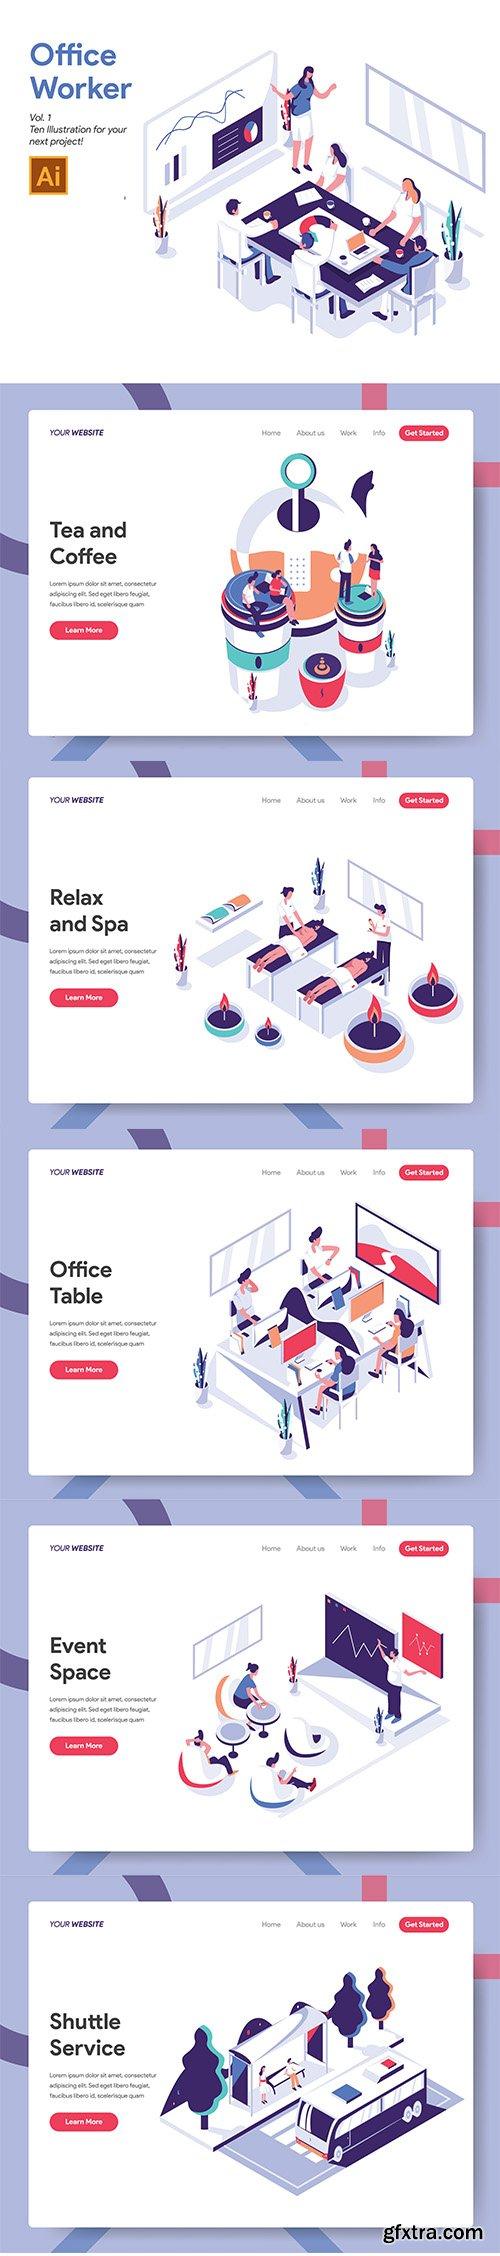 Vector Illustrations Set - Office Worker Illustration Vol 1